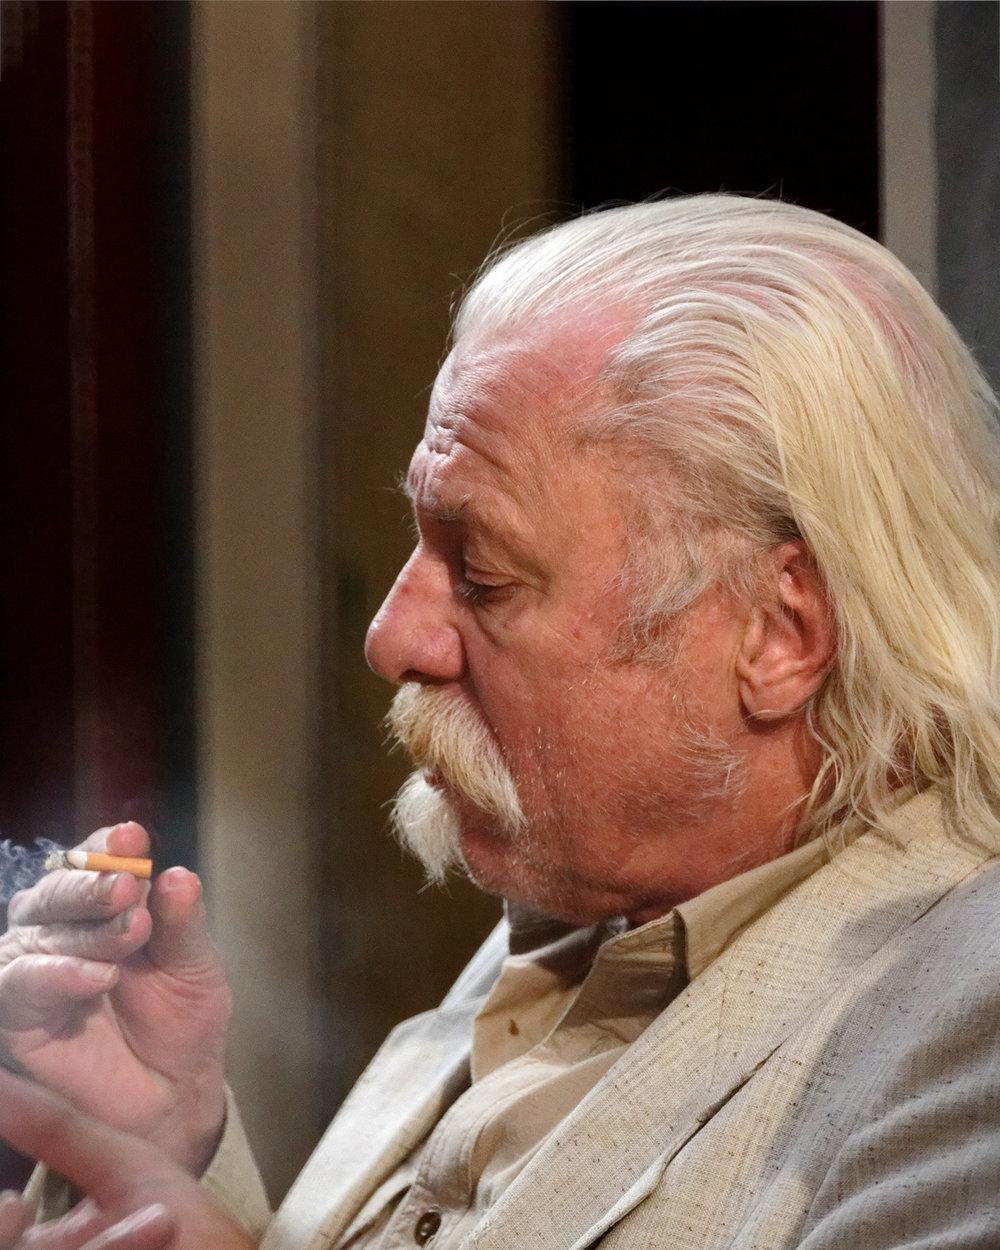 Amsterdam Cafe Smoker